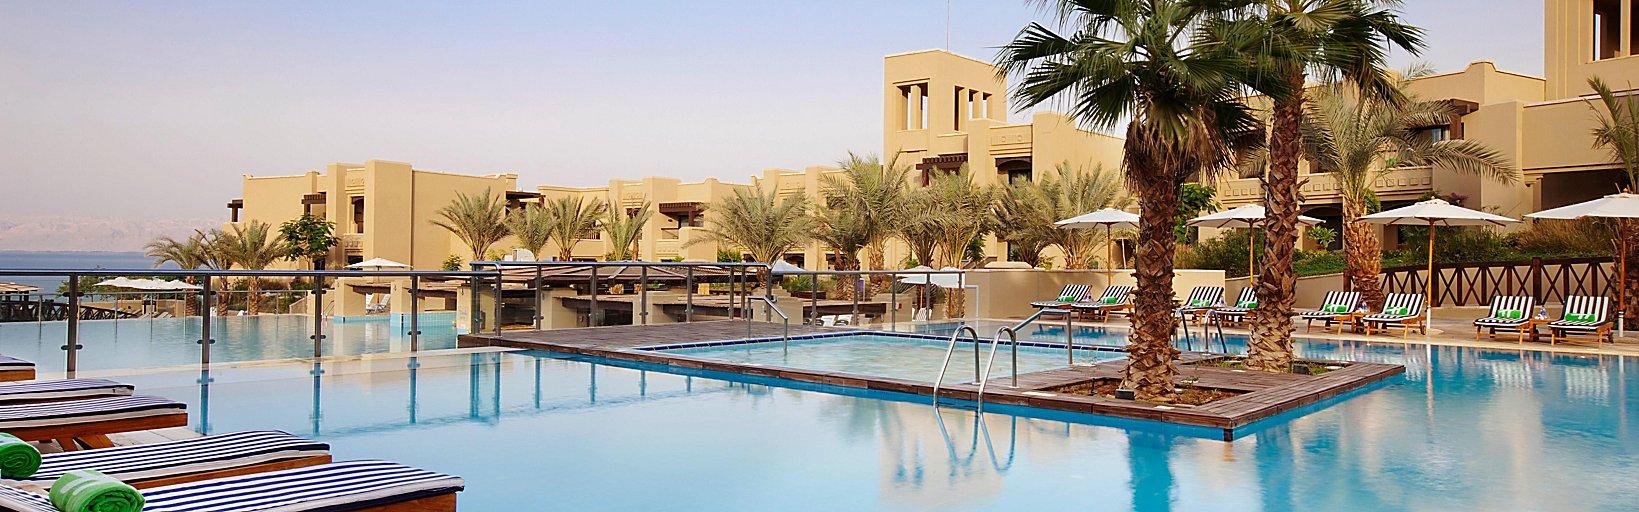 Holiday Inn Resort Dead Sea Pool